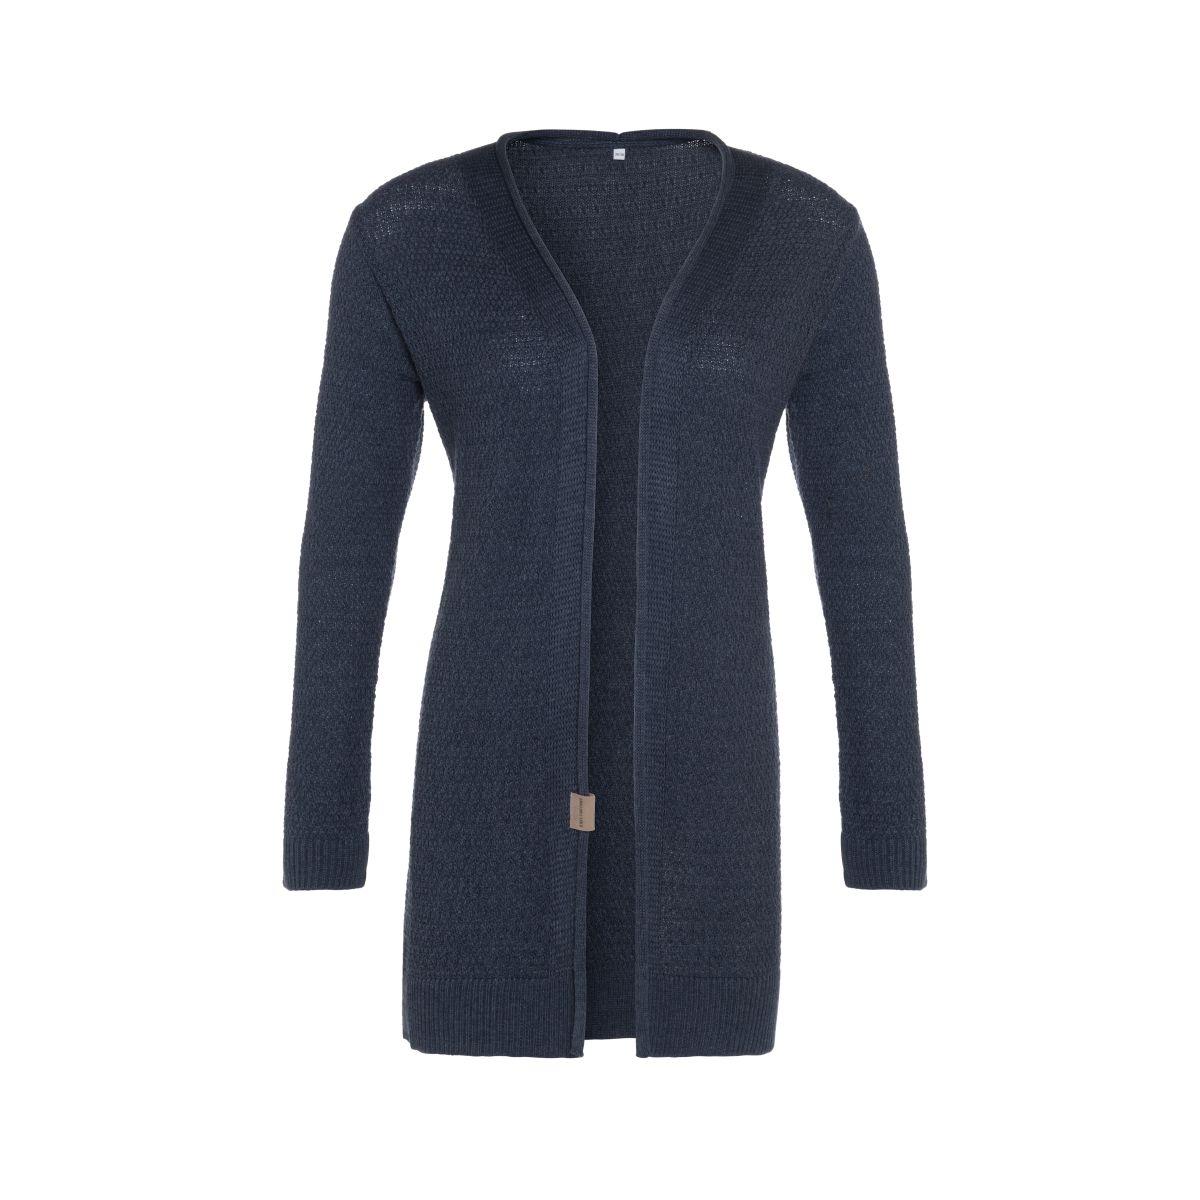 june knitted cardigan denim 3638